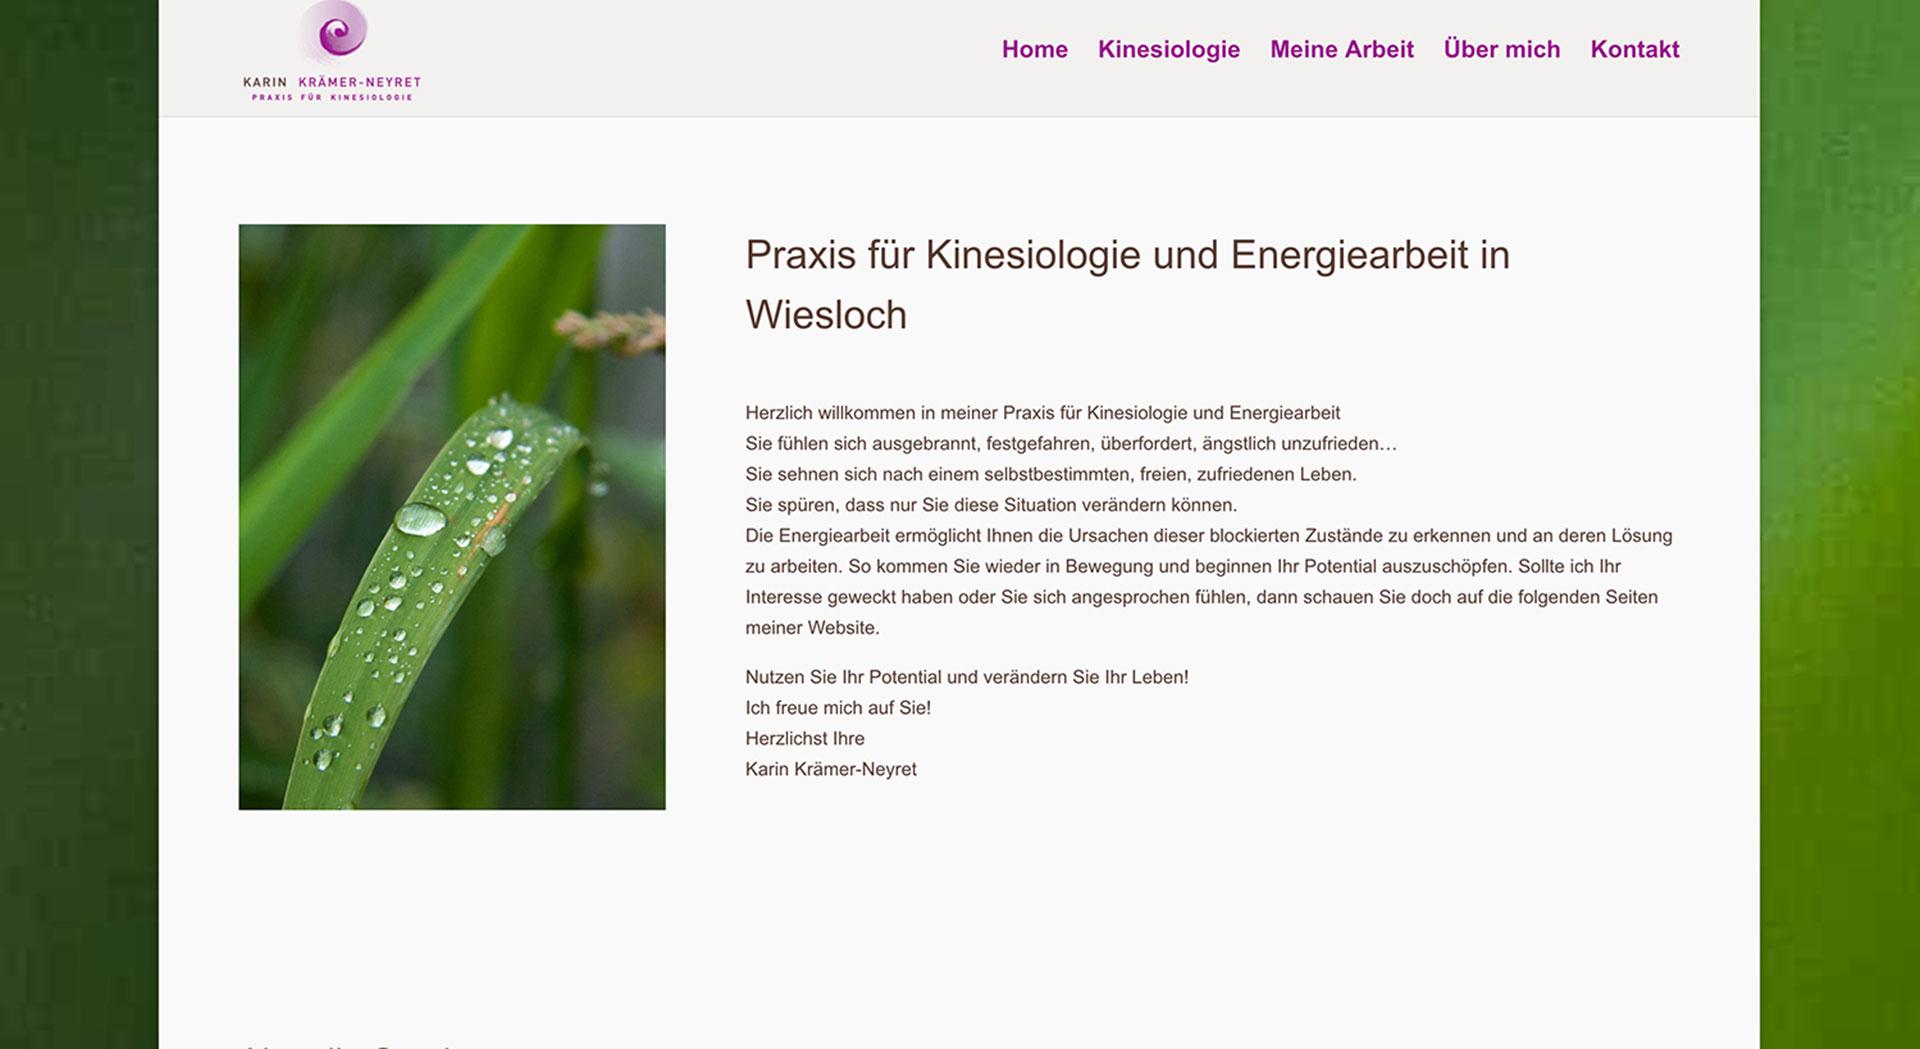 Kinesiologische Praxis | Karin Krämer-Neyret